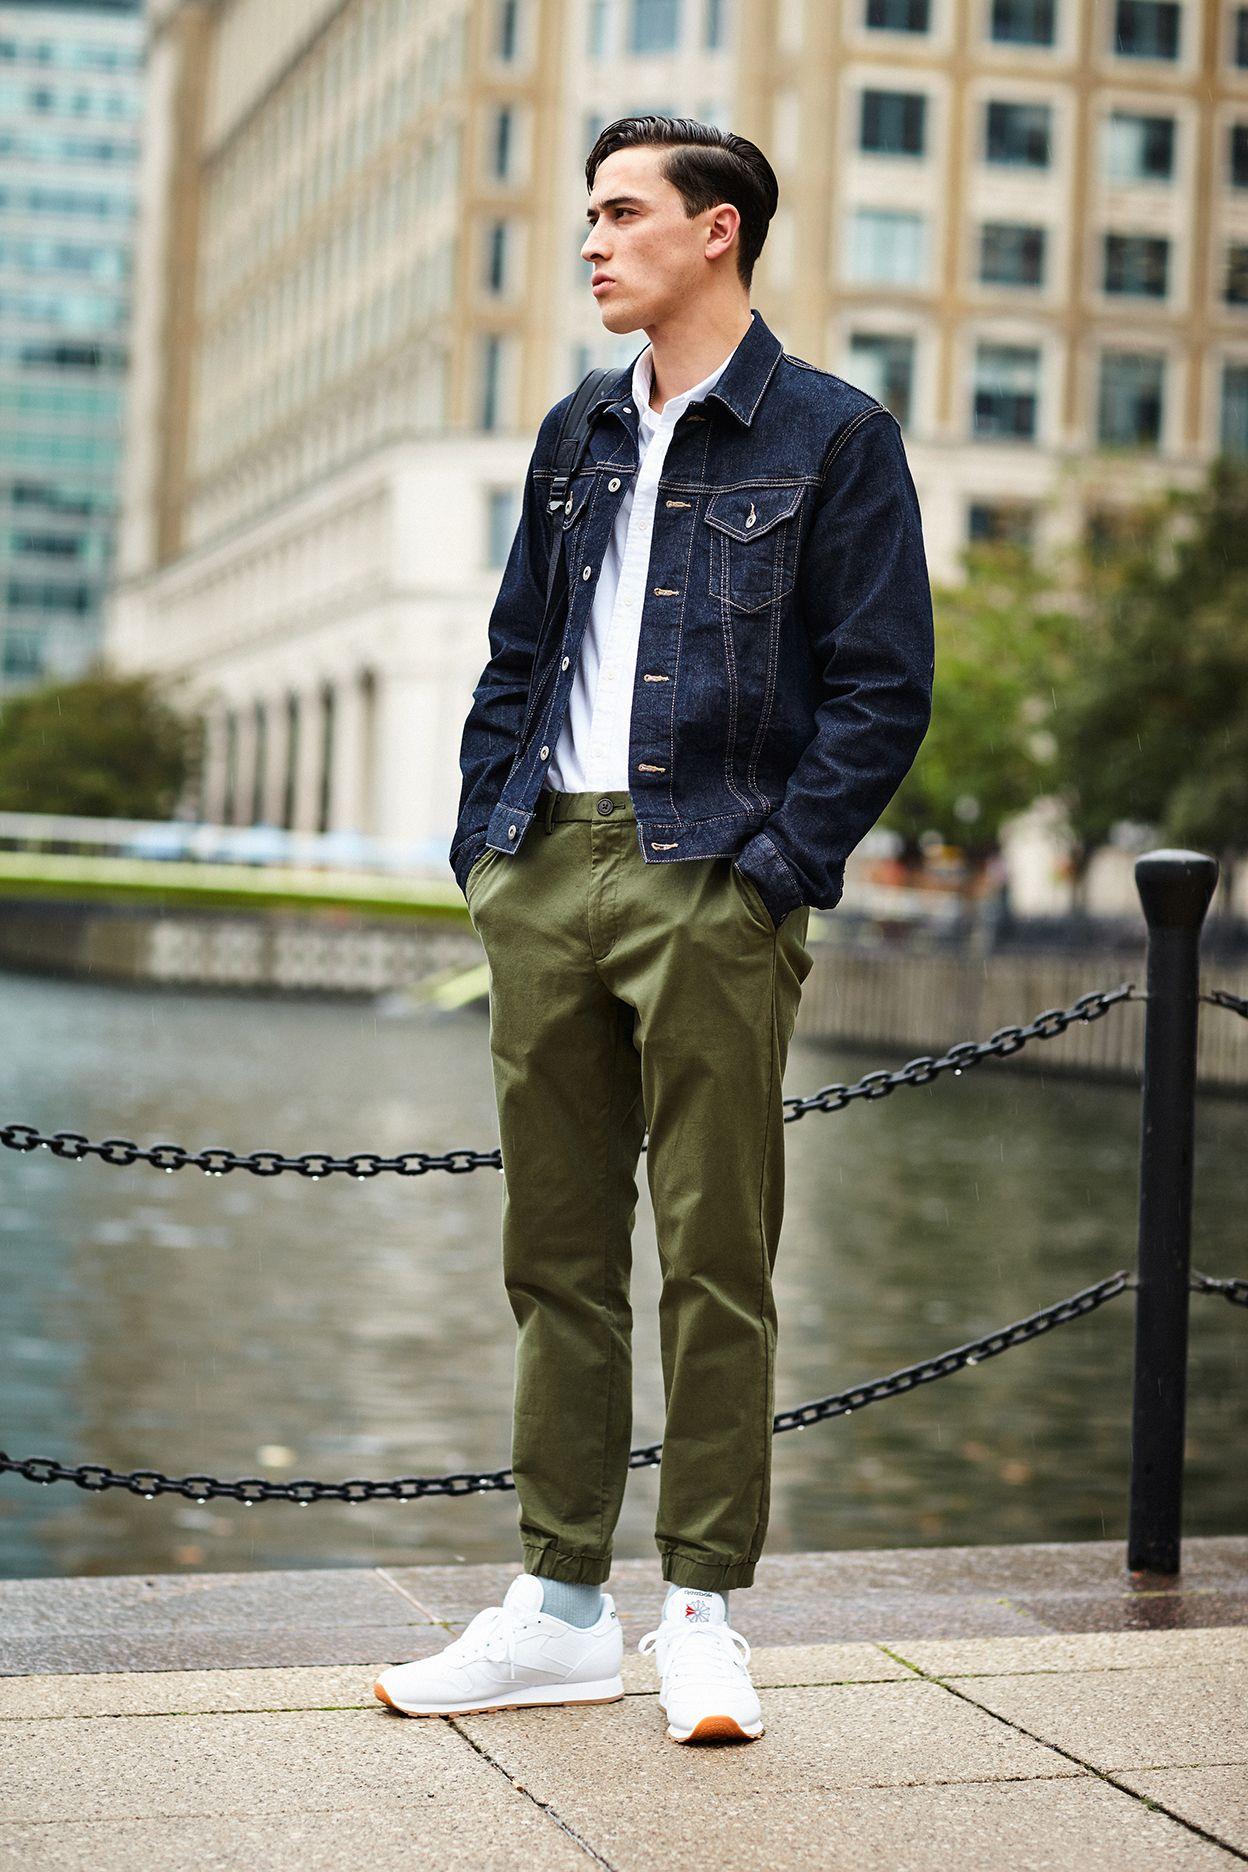 Men Denim Jacket | Uniqlo Man Style And Menu0026#39;s Fashion